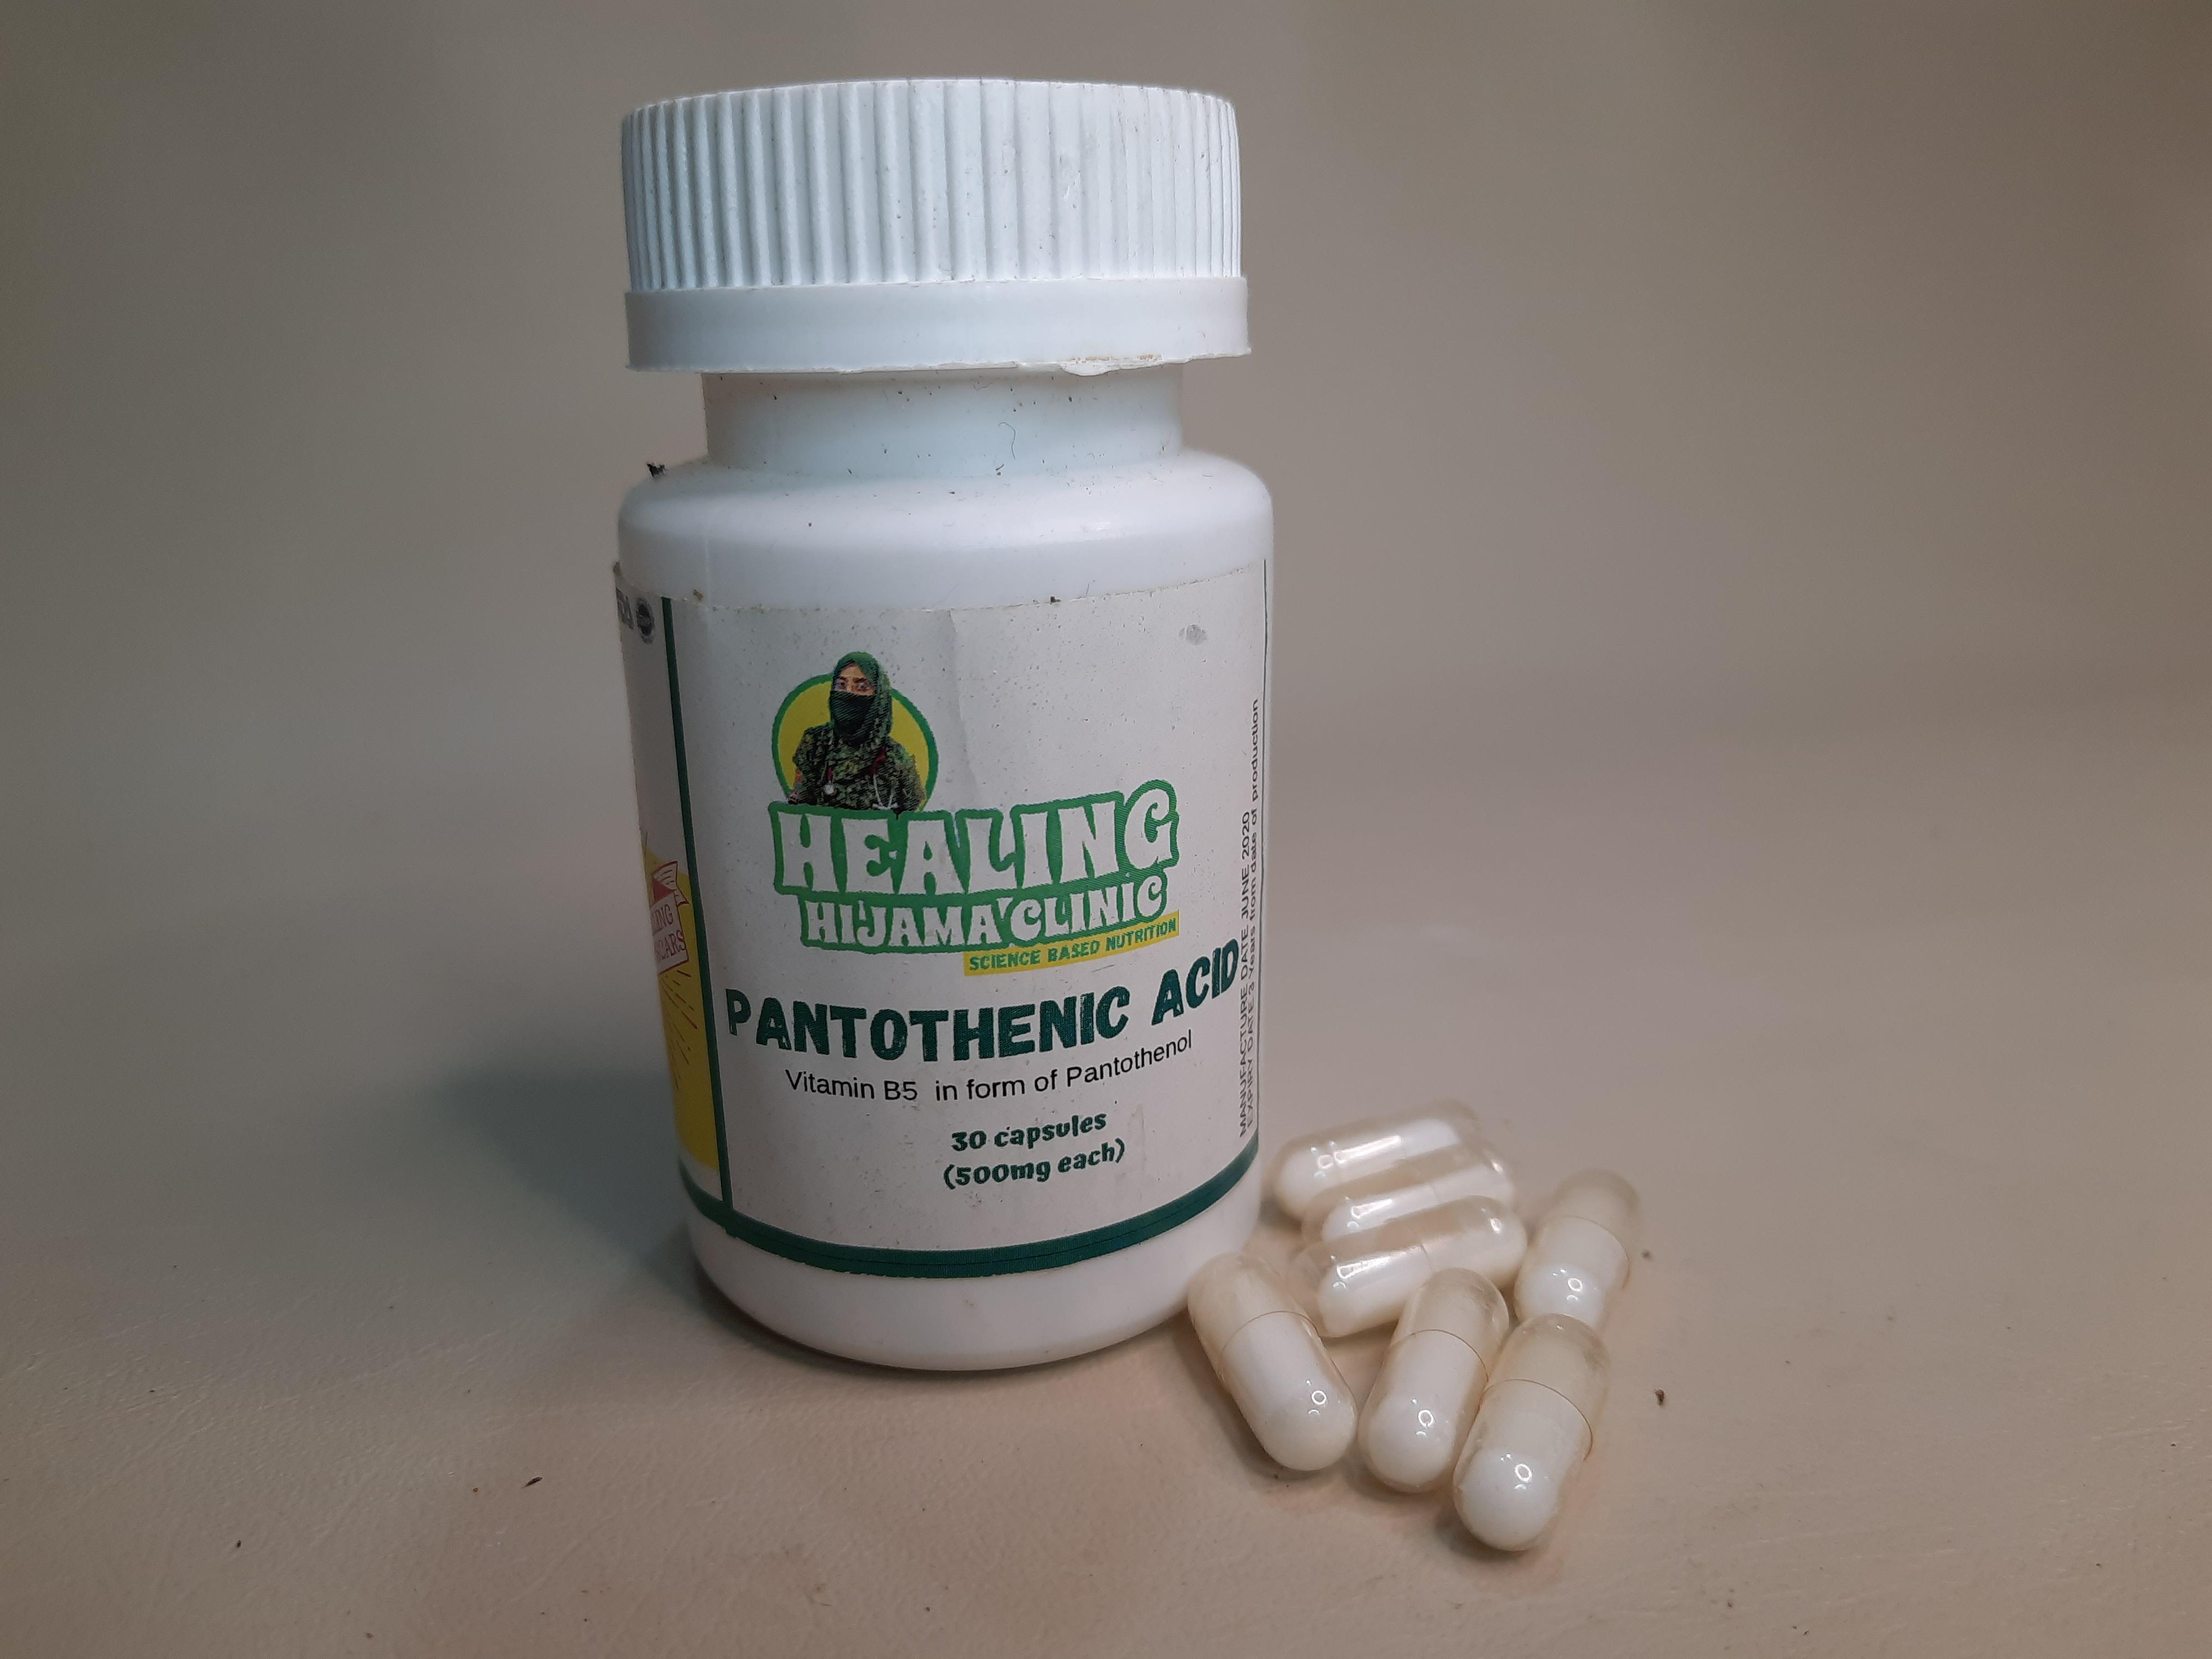 PANTOTHENIC ACID (VITAMIN B5)